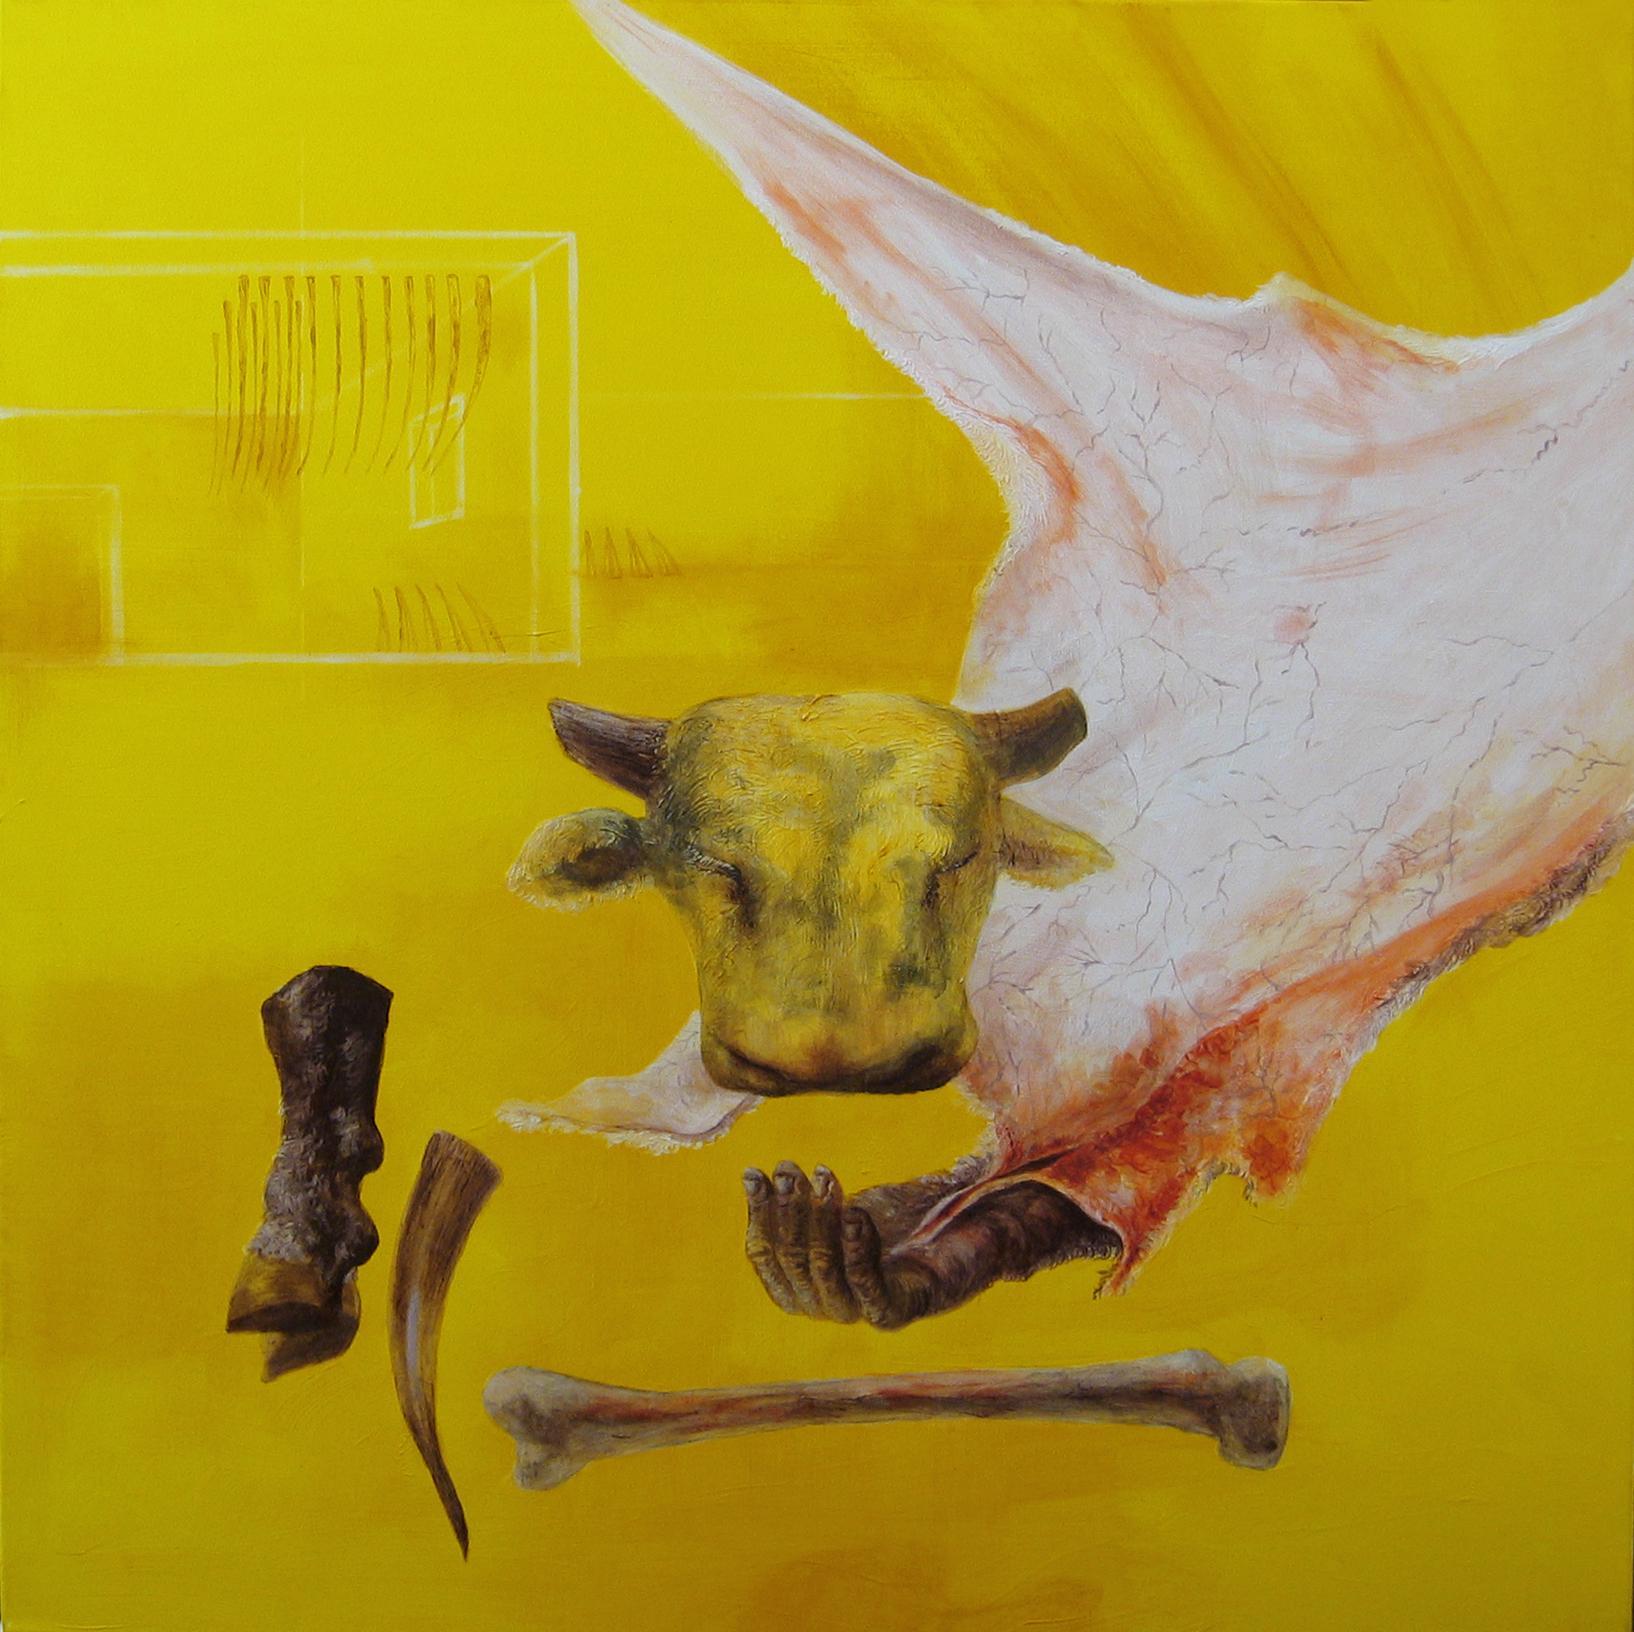 Earth's Skin - 21st Century, Yellow, Figurative Art, Animal, Myth, Contemporary